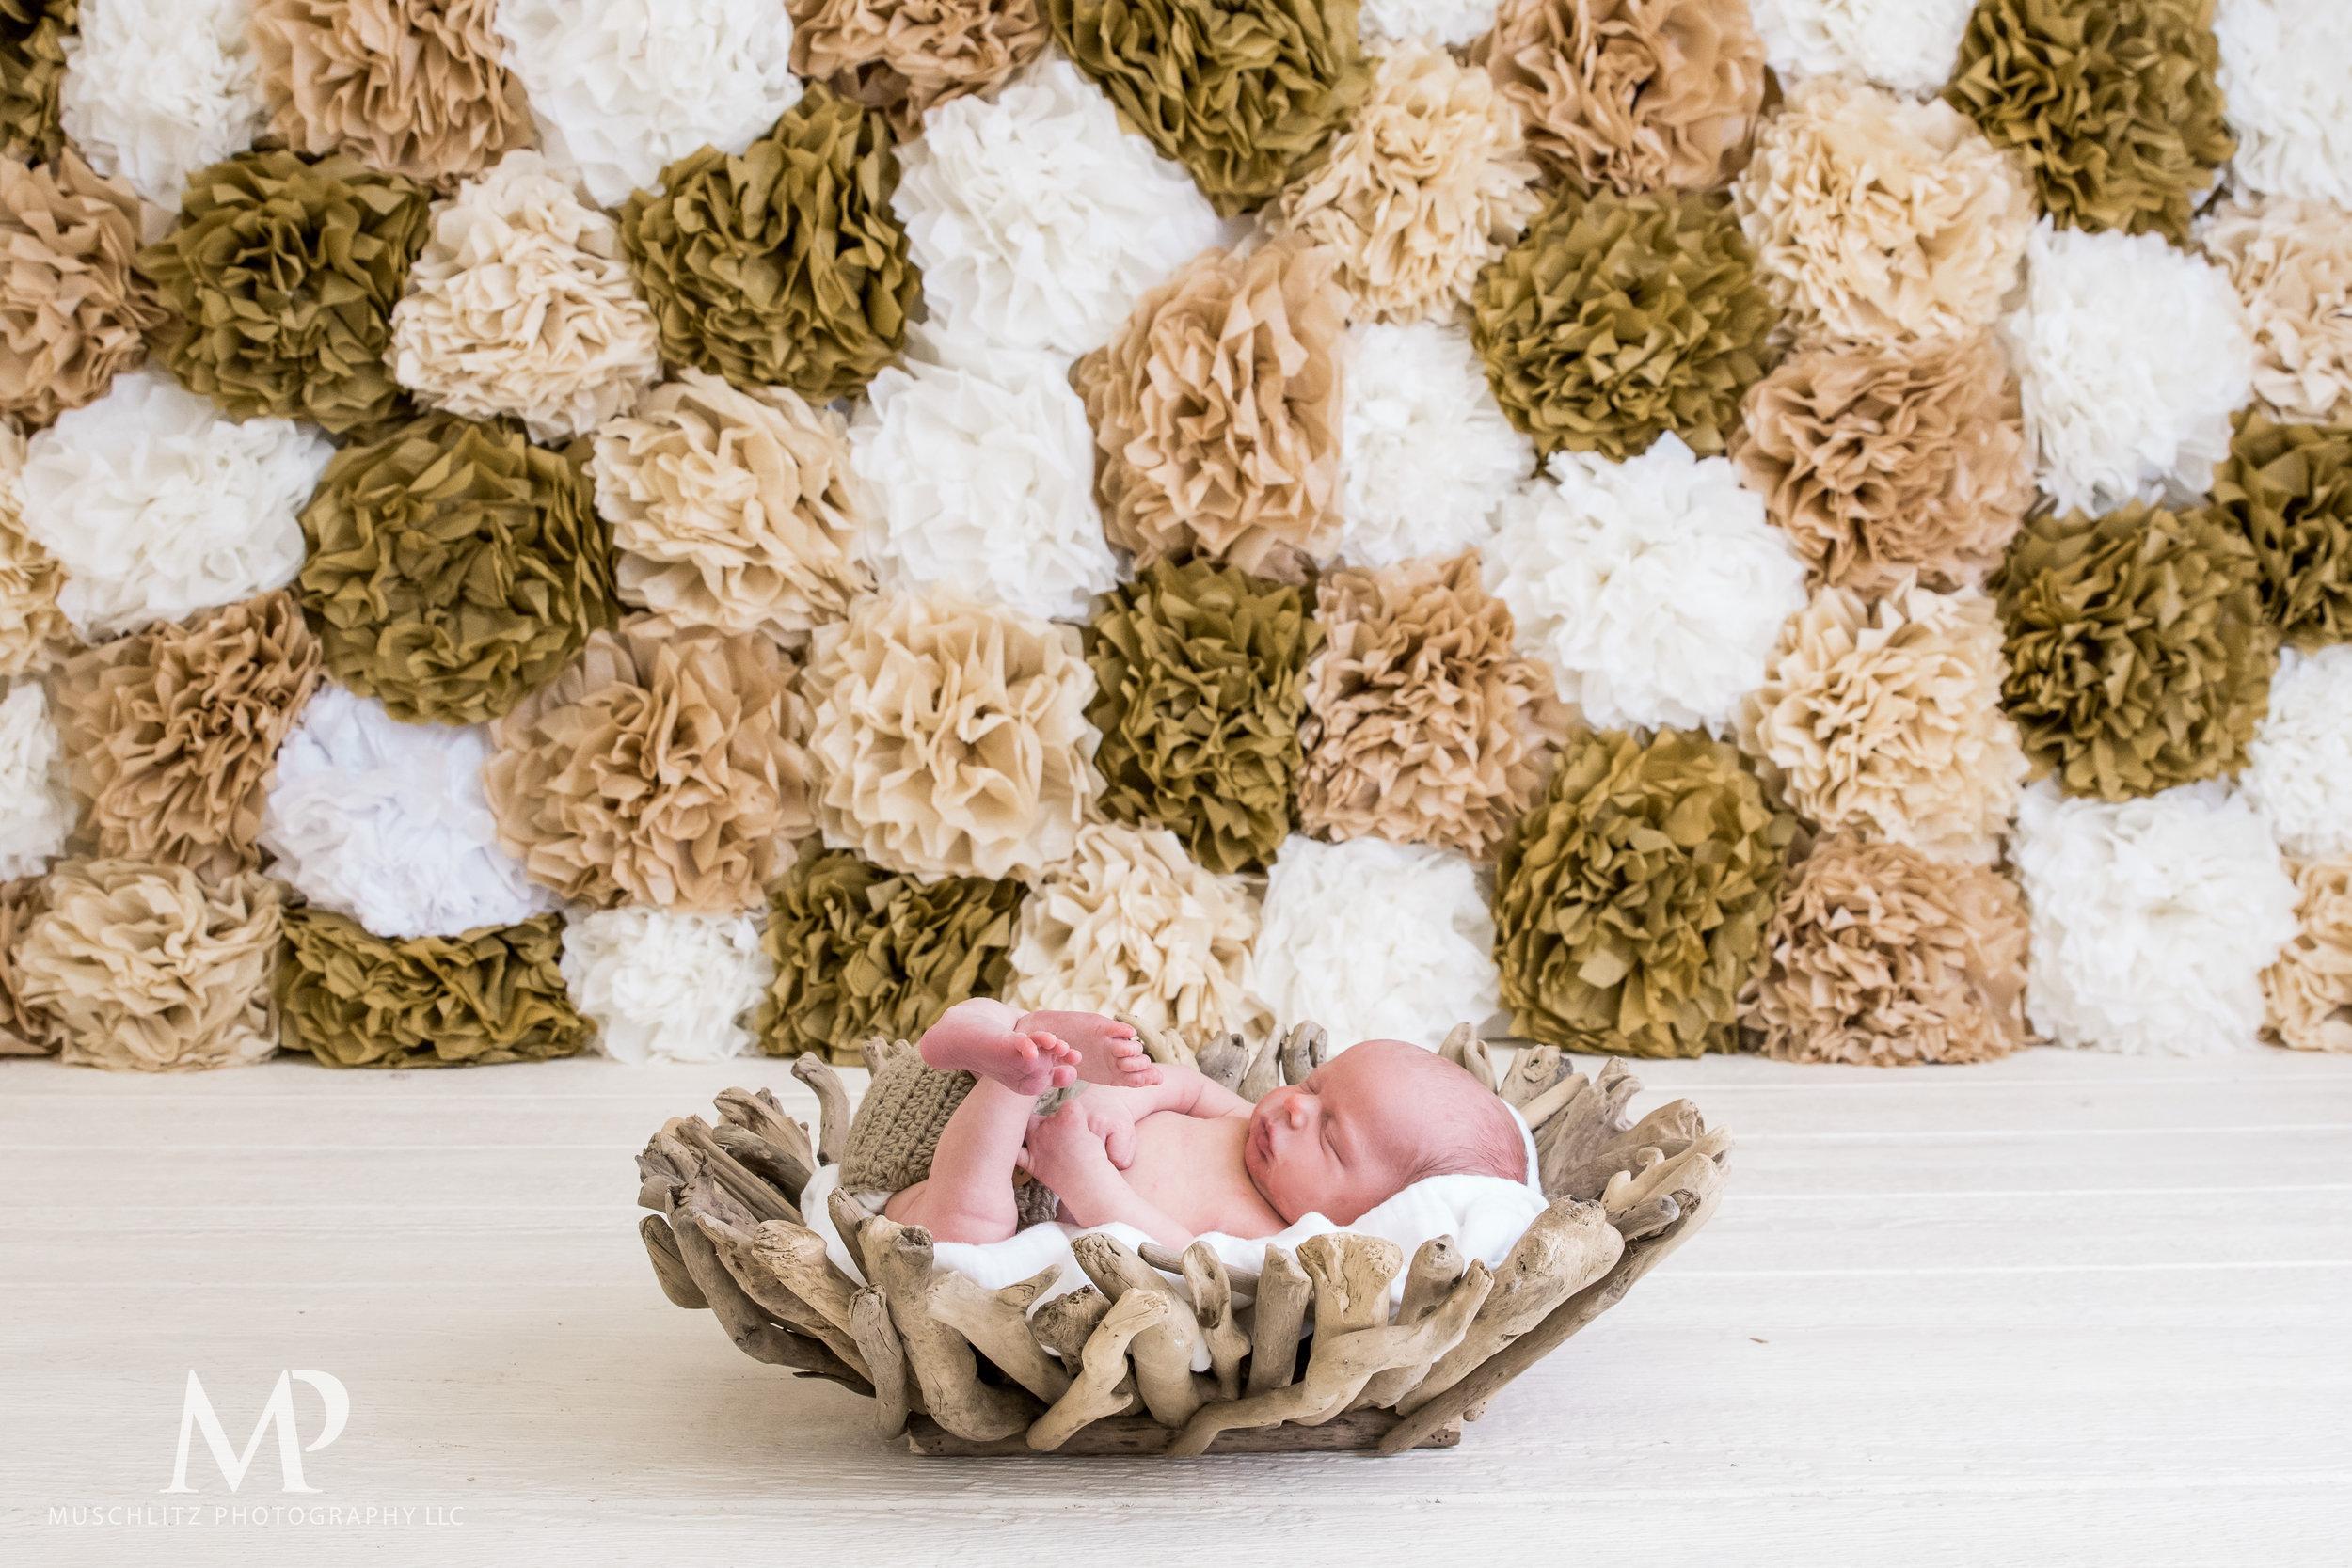 newborn-baby-portraits-photos-studio-holiday-columbus-gahanna-ohio-muschlitz-photography-014.JPG